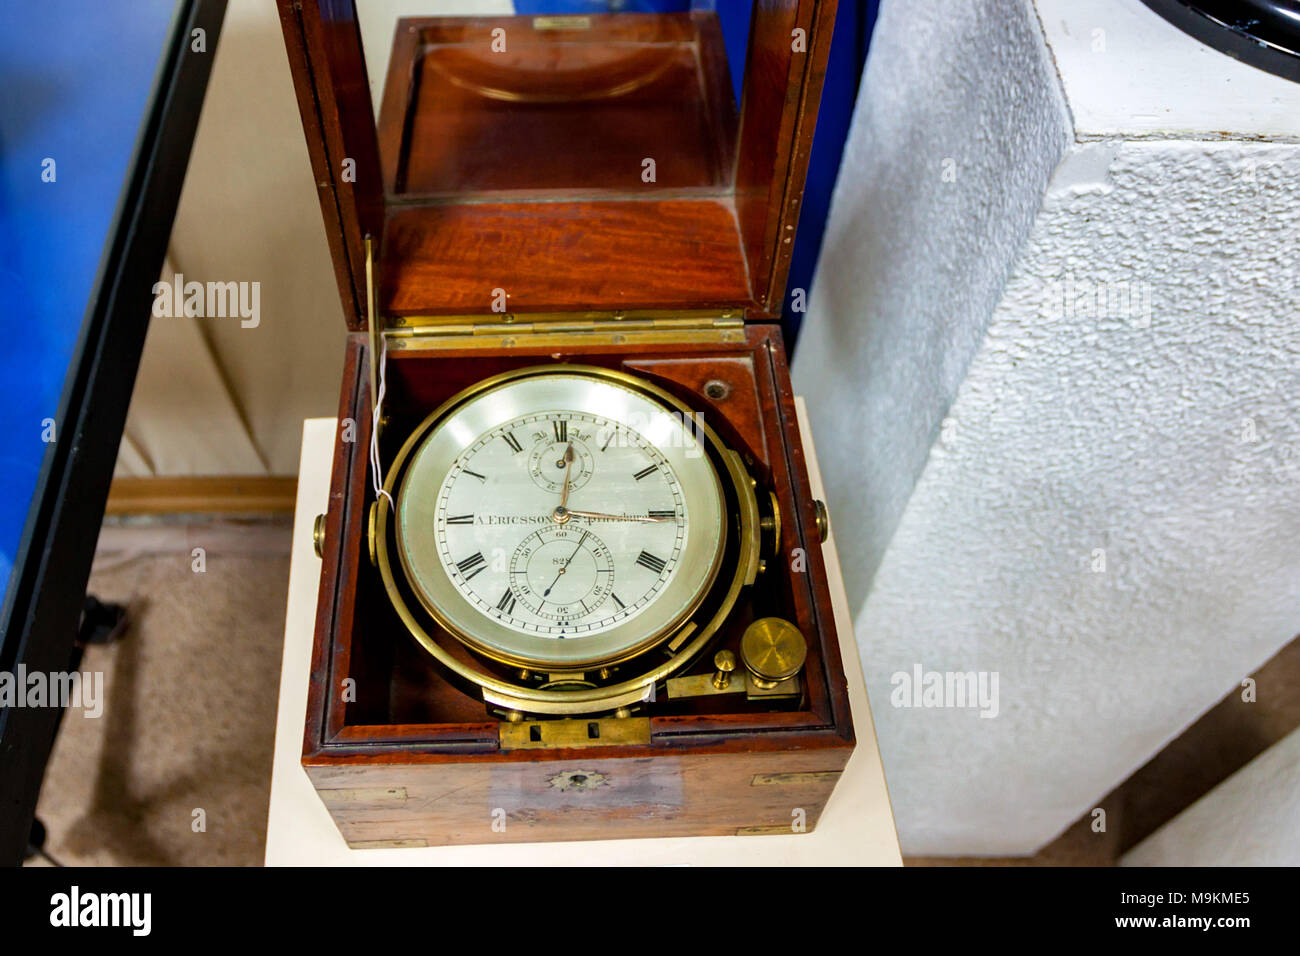 SEVASTOPOL, RUSSIA - MARCH 19, 2011: Old marine chronometer in Sevastopol museum - Stock Image